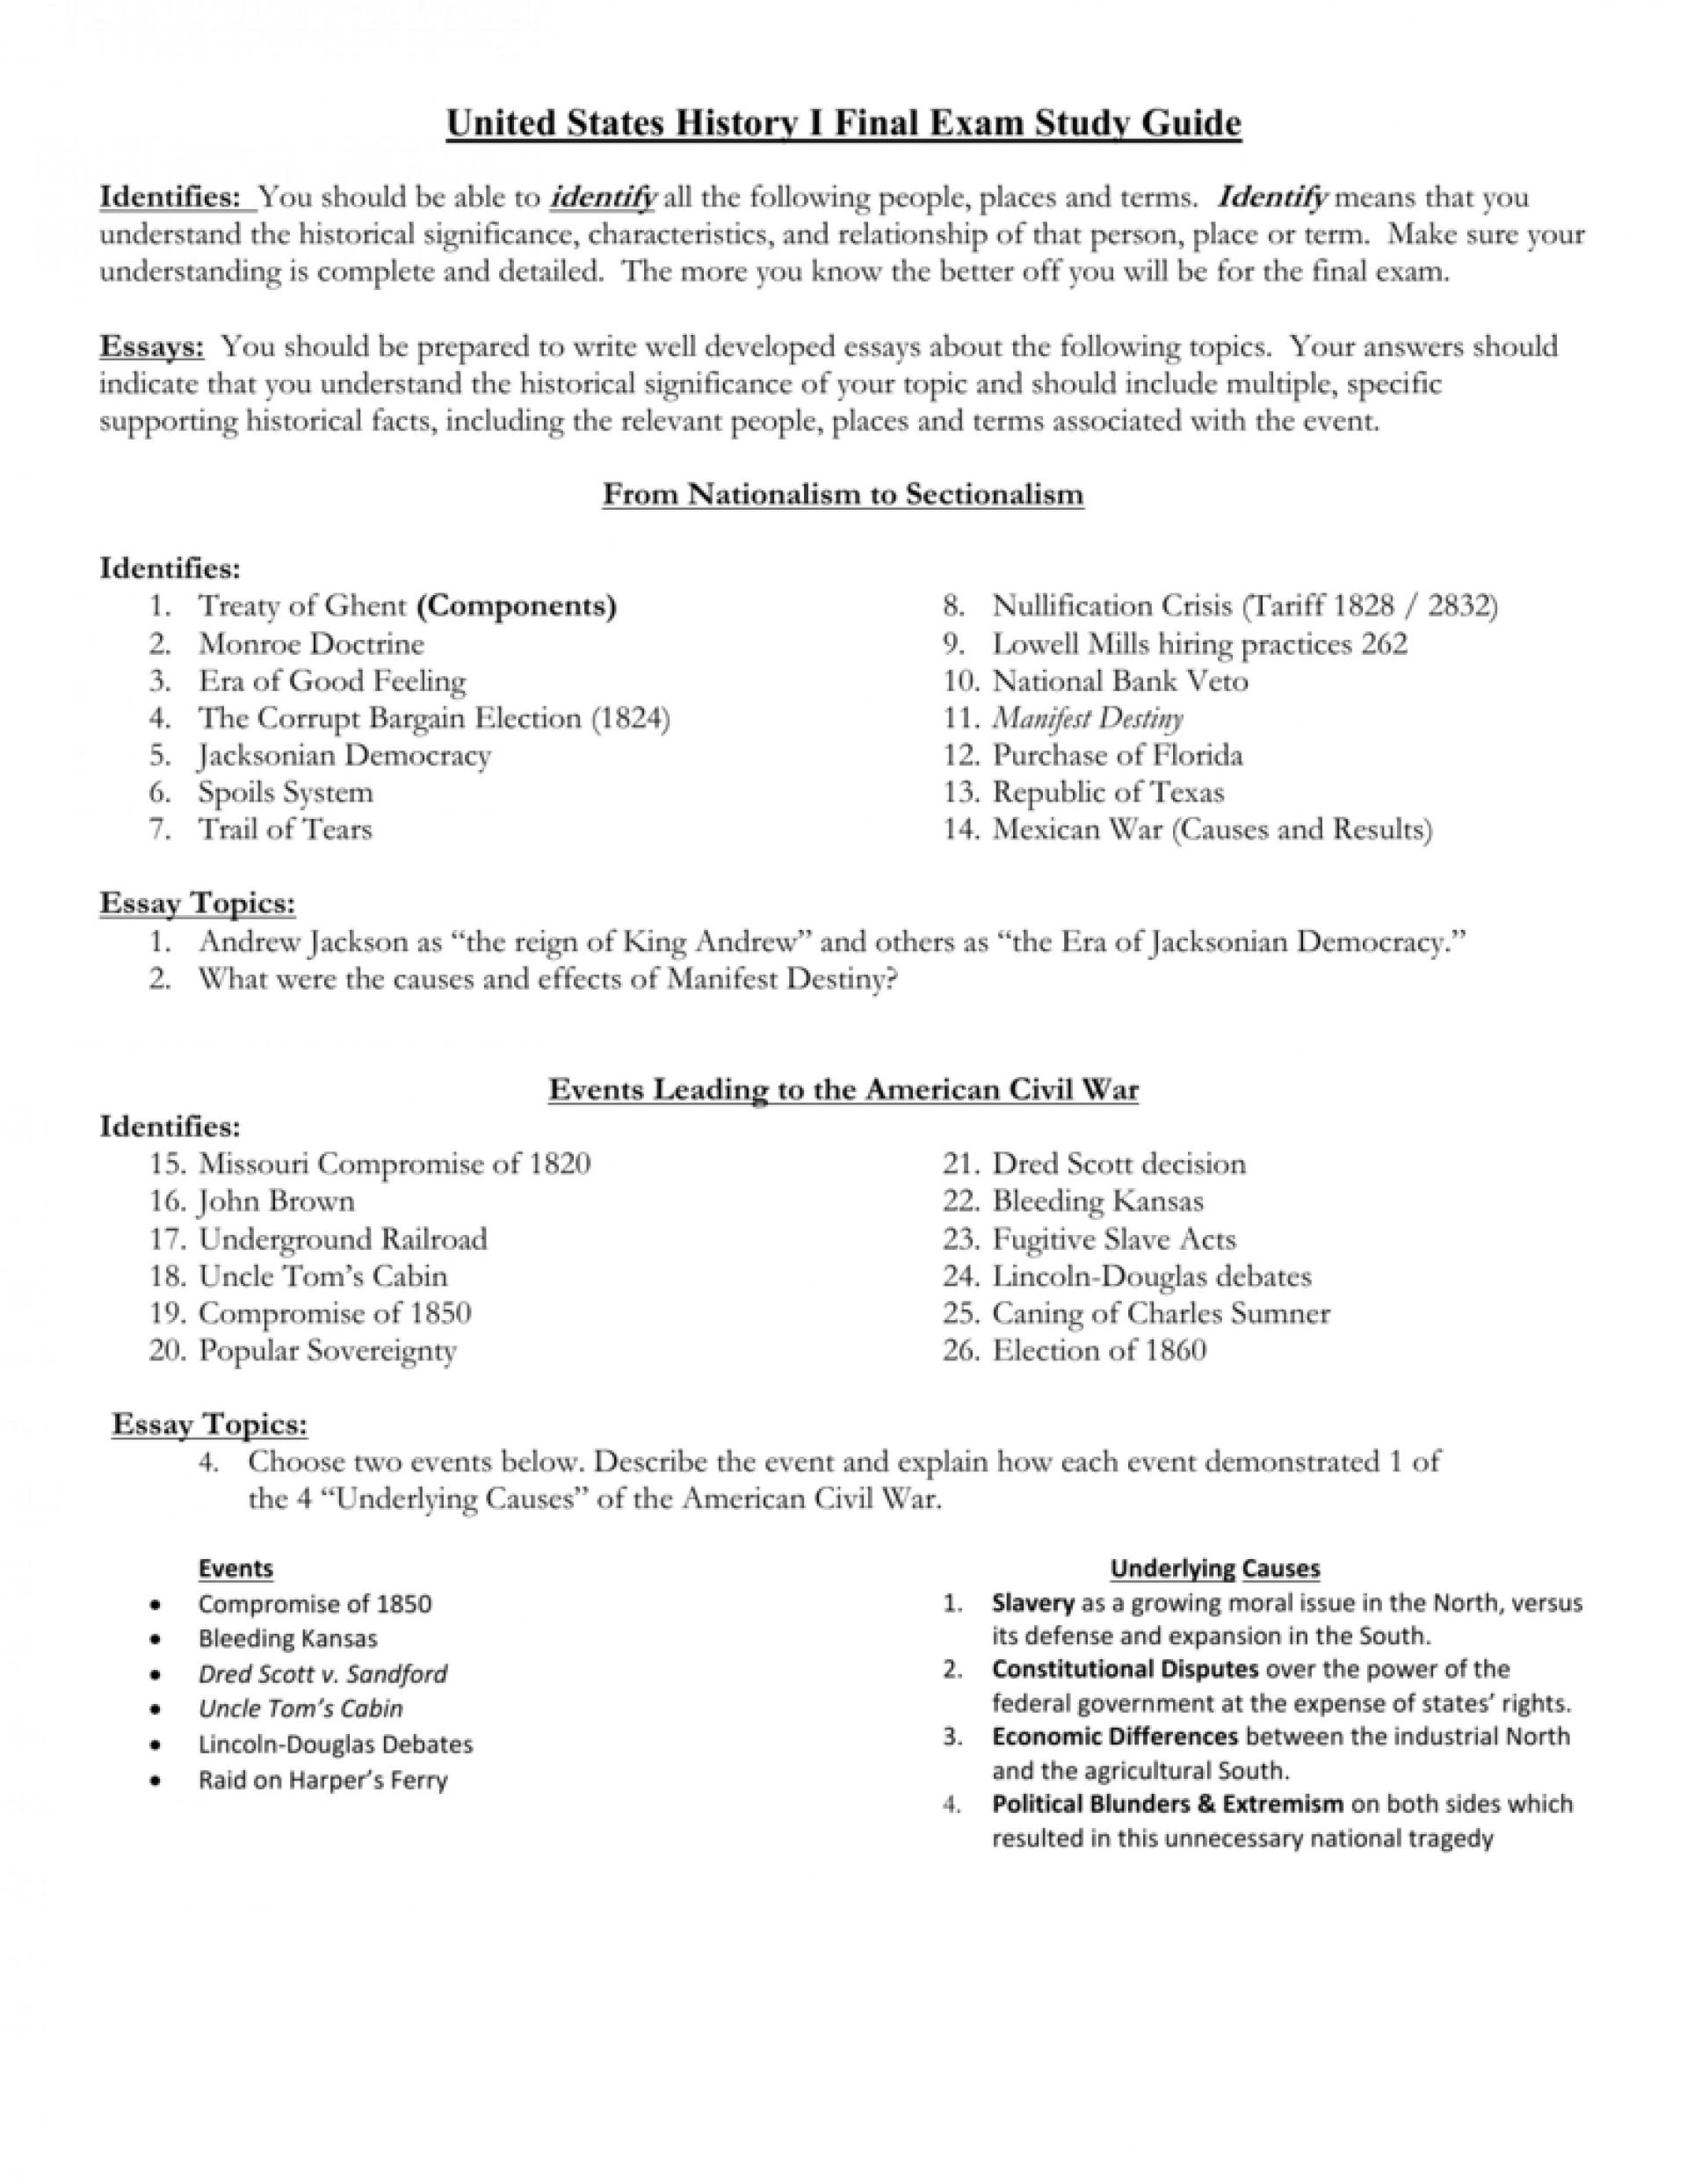 010 Essay Example Manifest Destiny 008013594 1 Impressive Prompt Outline Introduction 1920